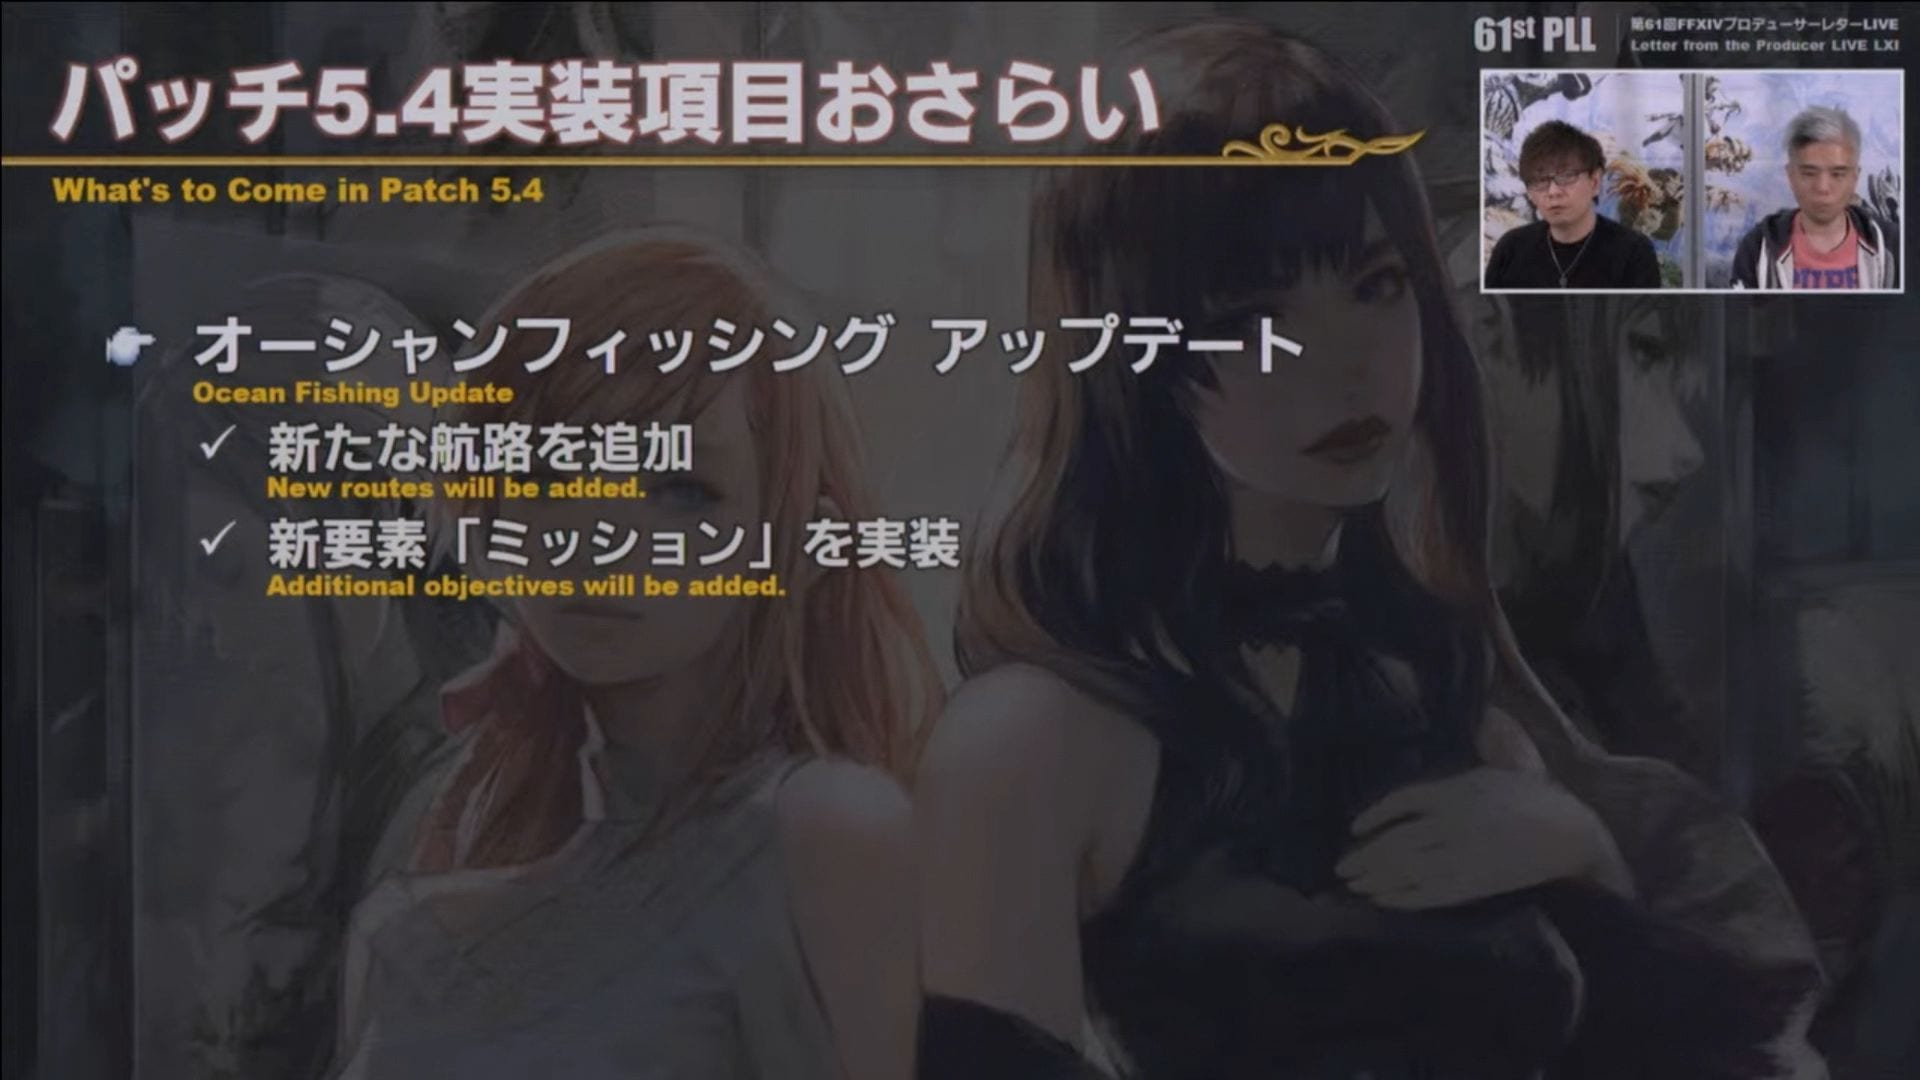 Final-Fantasy-XIV-Screenshot-2020-11-27-13-25-16.jpg